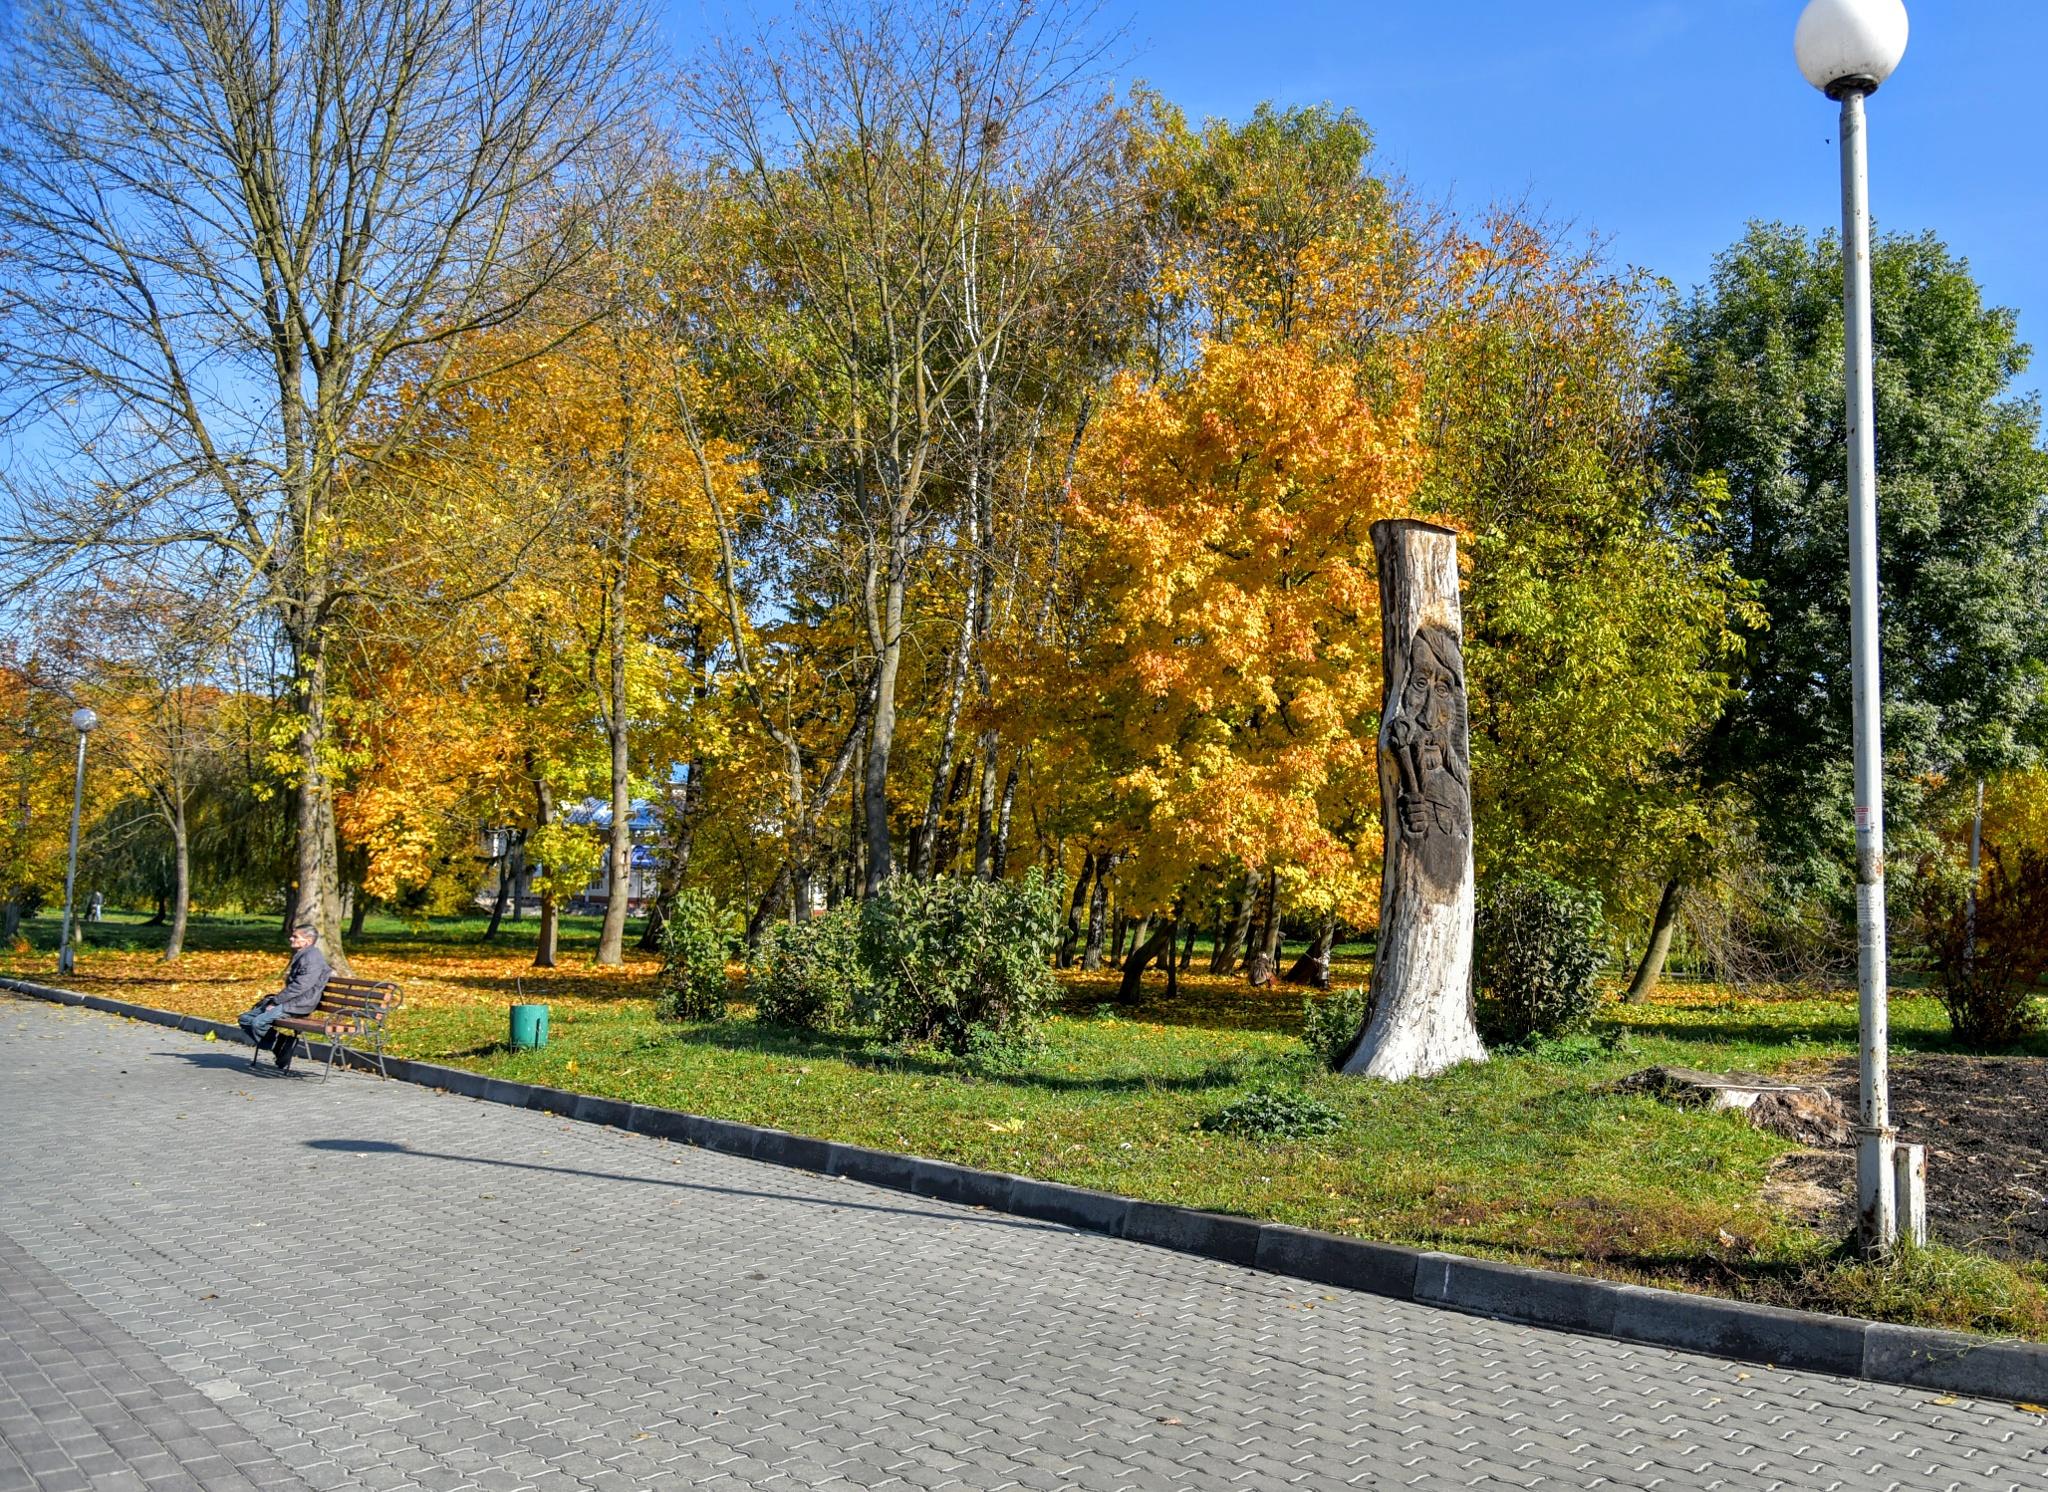 Autumn by mikhailomikhaylovsky